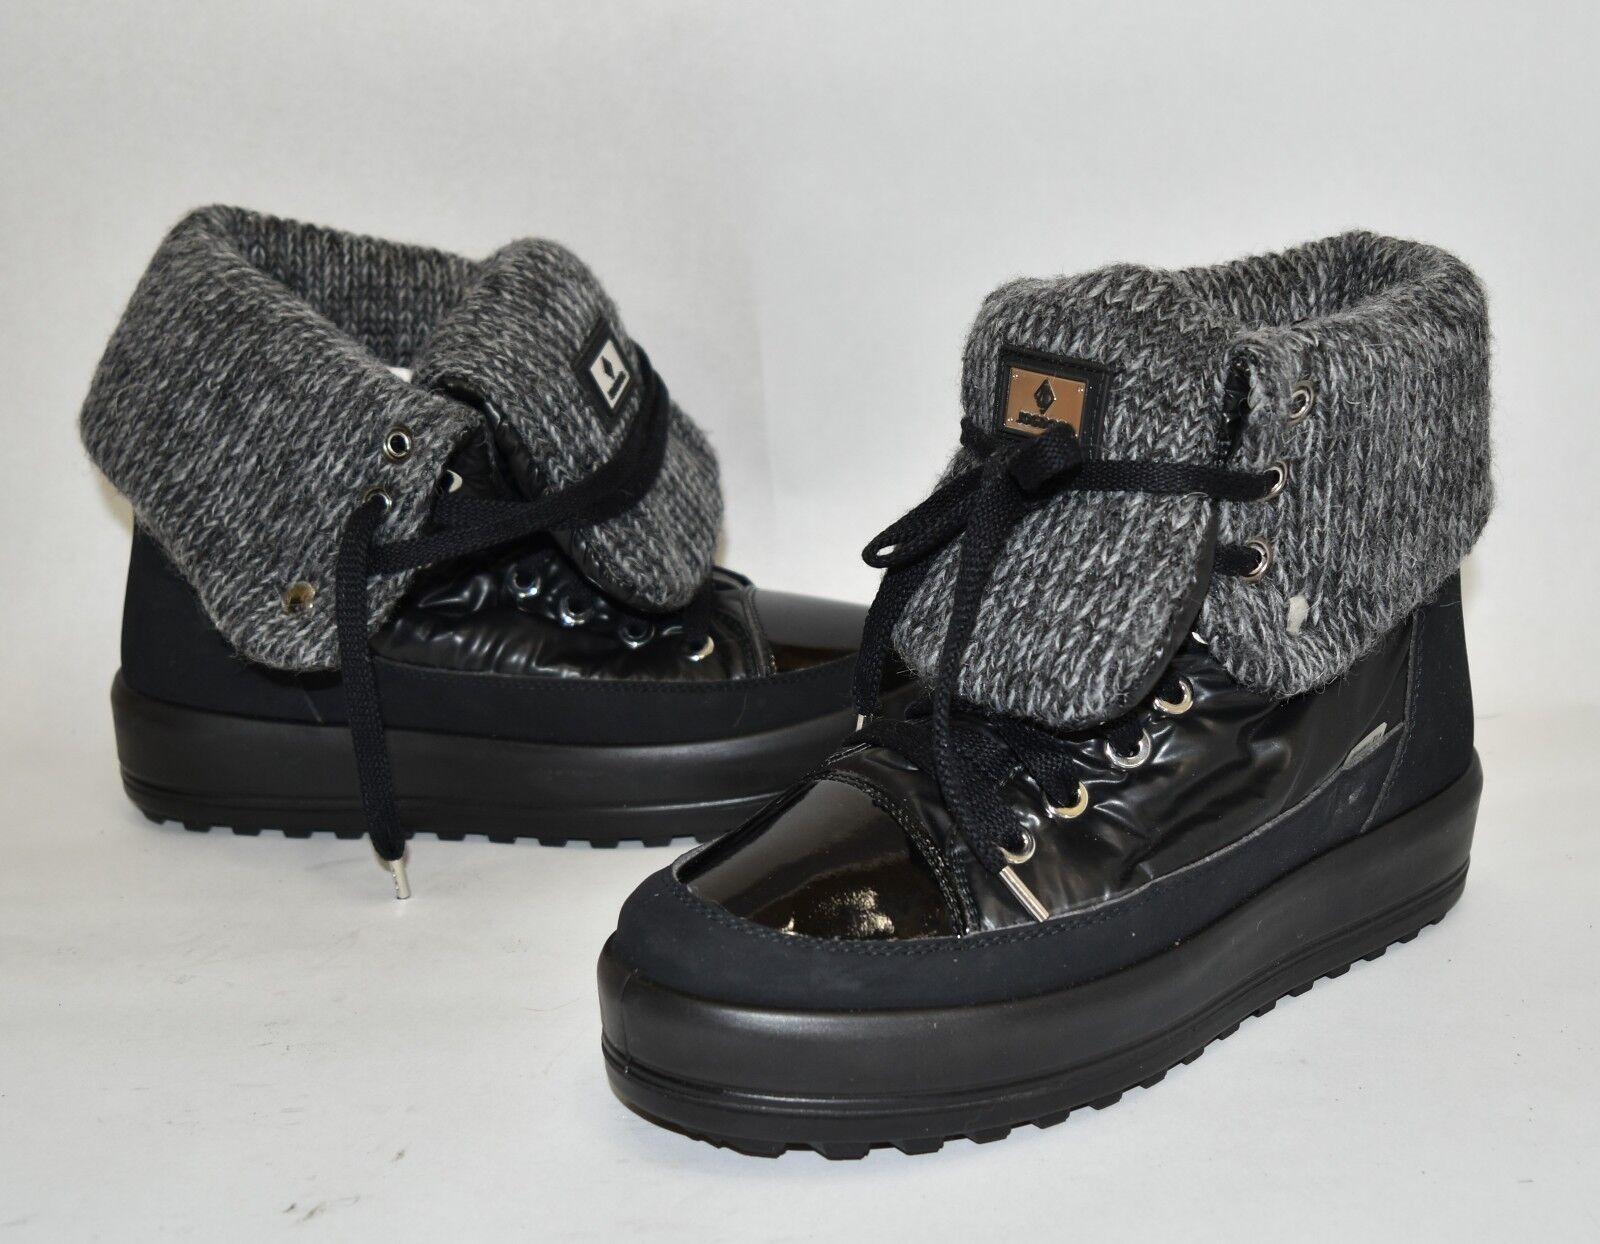 disegni esclusivi New Jog Dog Val Louron Foldover Waterproof avvioie nero nero nero Sz 41 Eu 11 US MSRP  388  grande vendita